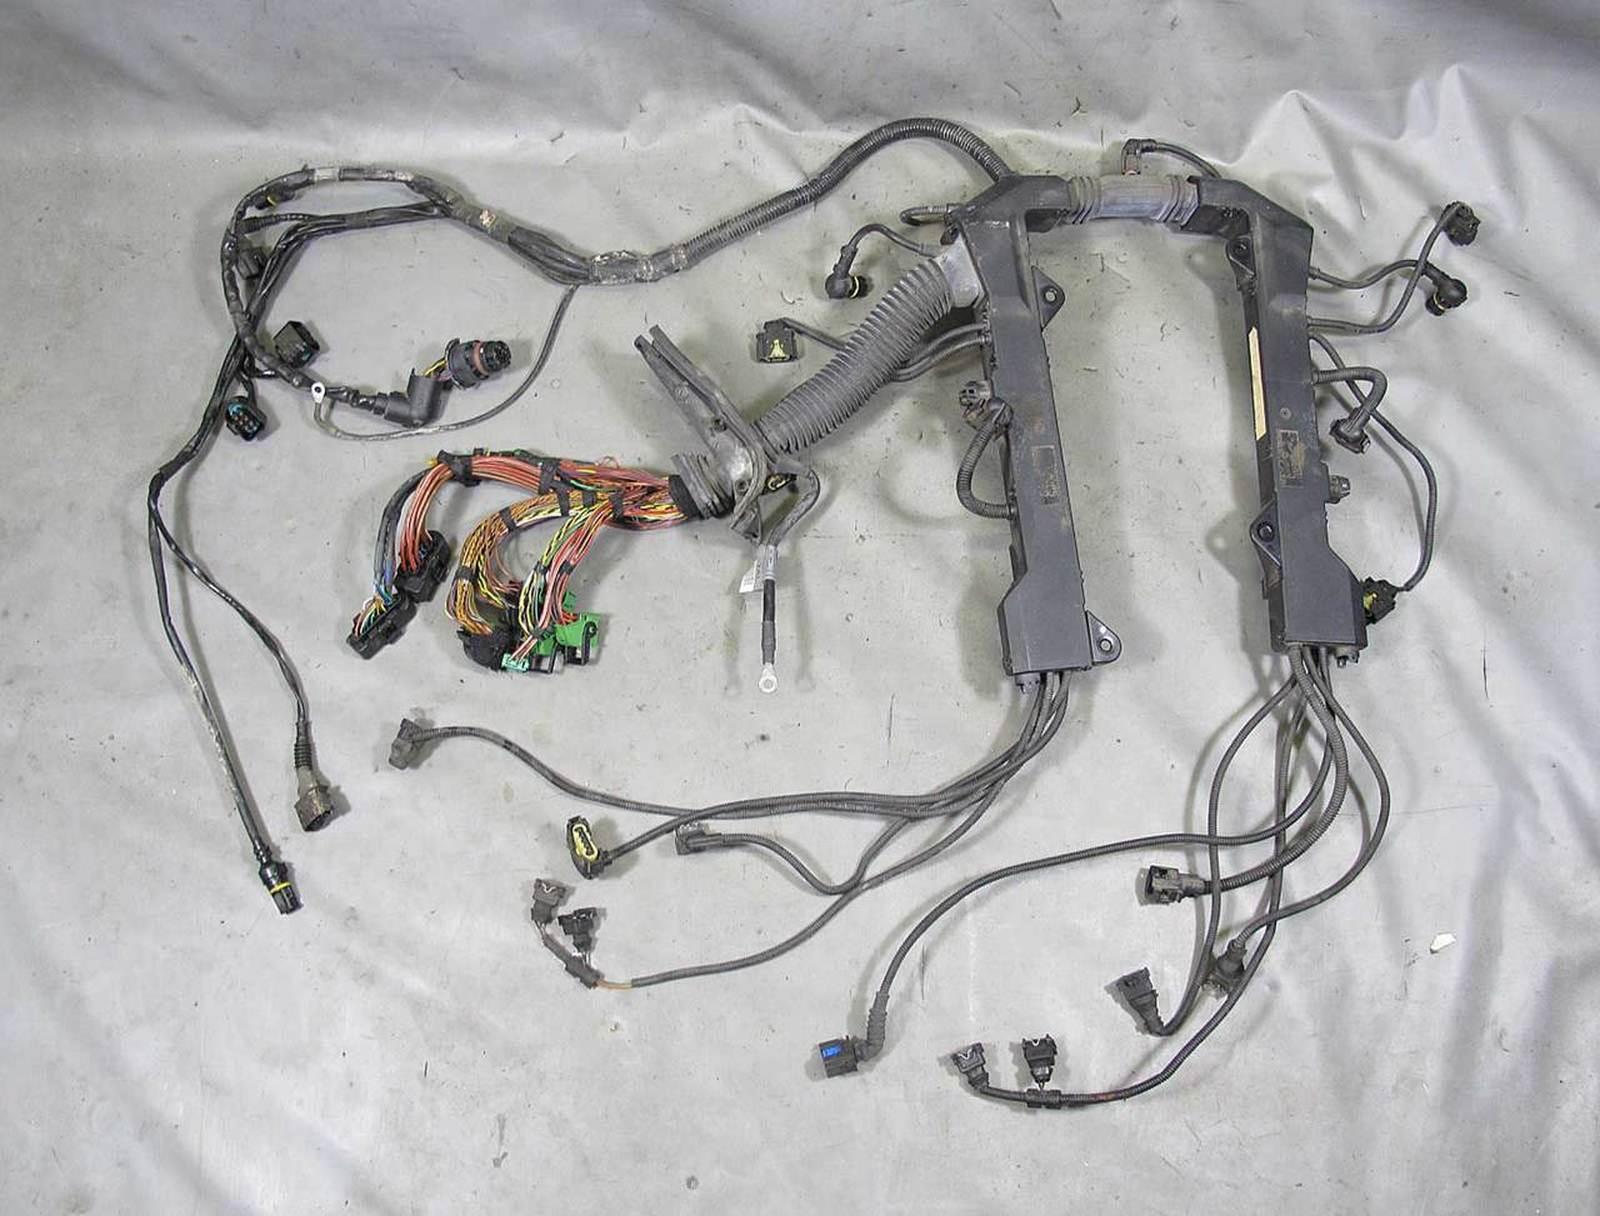 da_4376] ford fusion also vacuum hose leak bmw x5 on bmw 540i radio diagram  download diagram  anist botse stic hylec aspi ponol rele mohammedshrine librar wiring 101